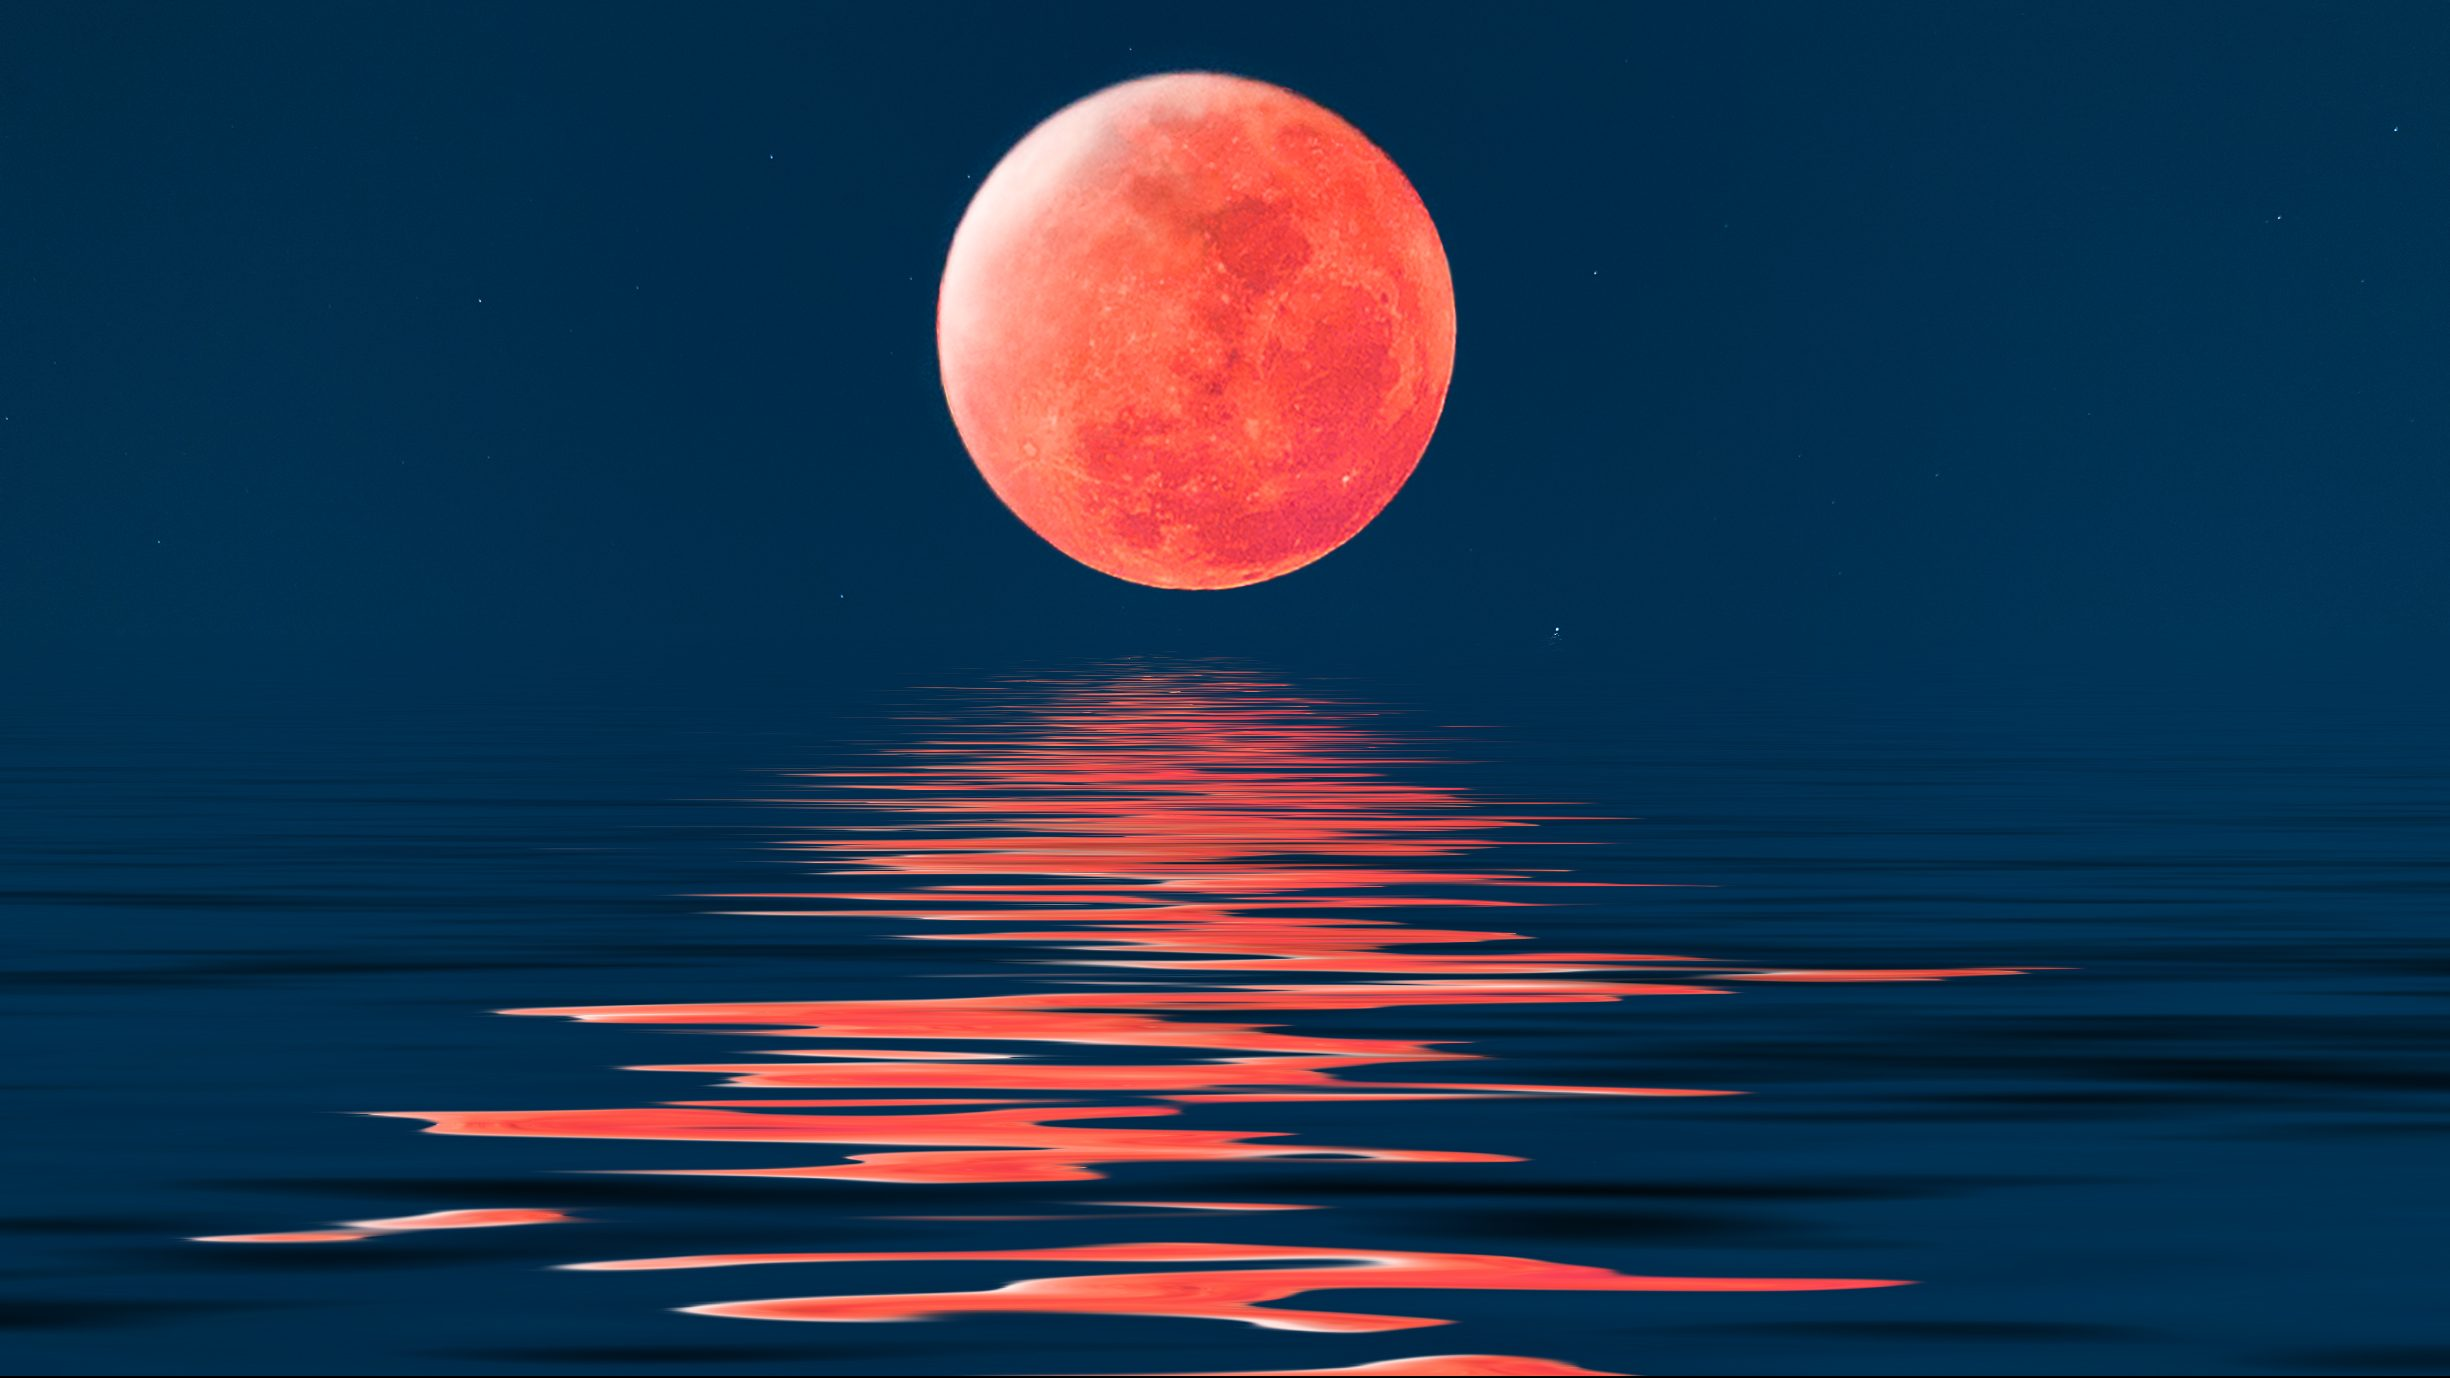 superluna-rosa-este-martes-7-de-abril